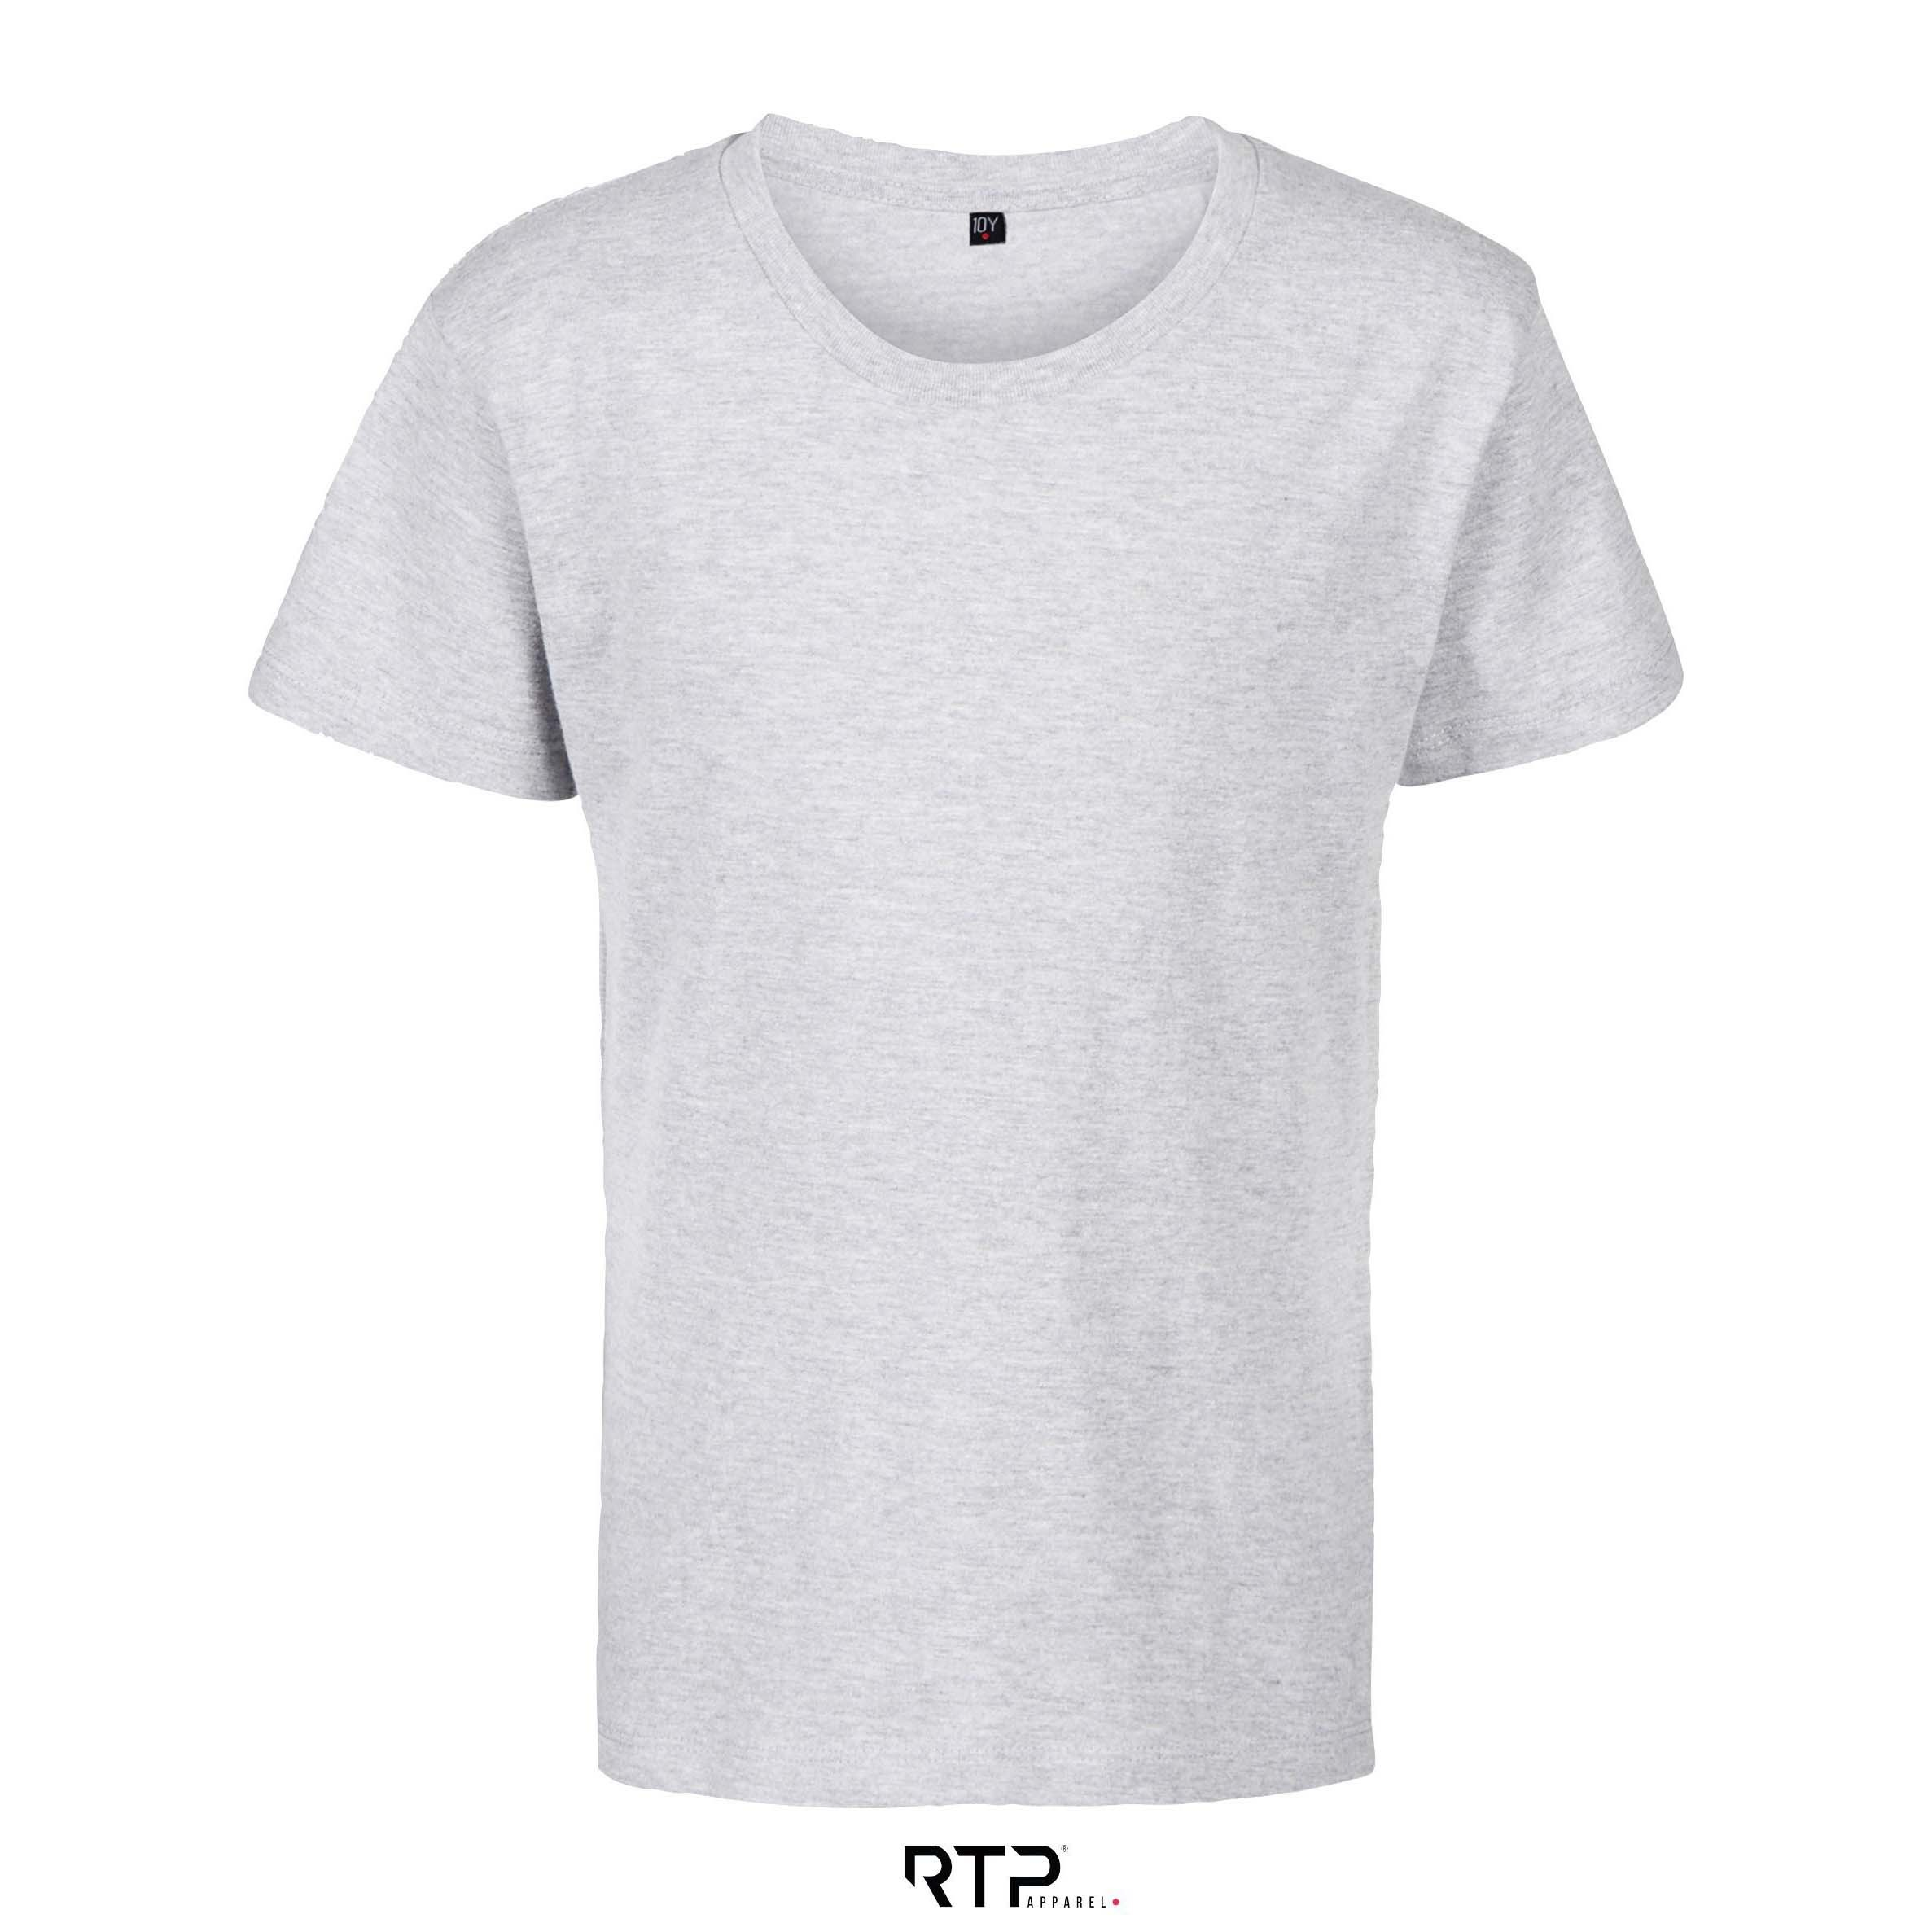 Tee-shirt enfant coupe cousu manches courtes Tempo 145